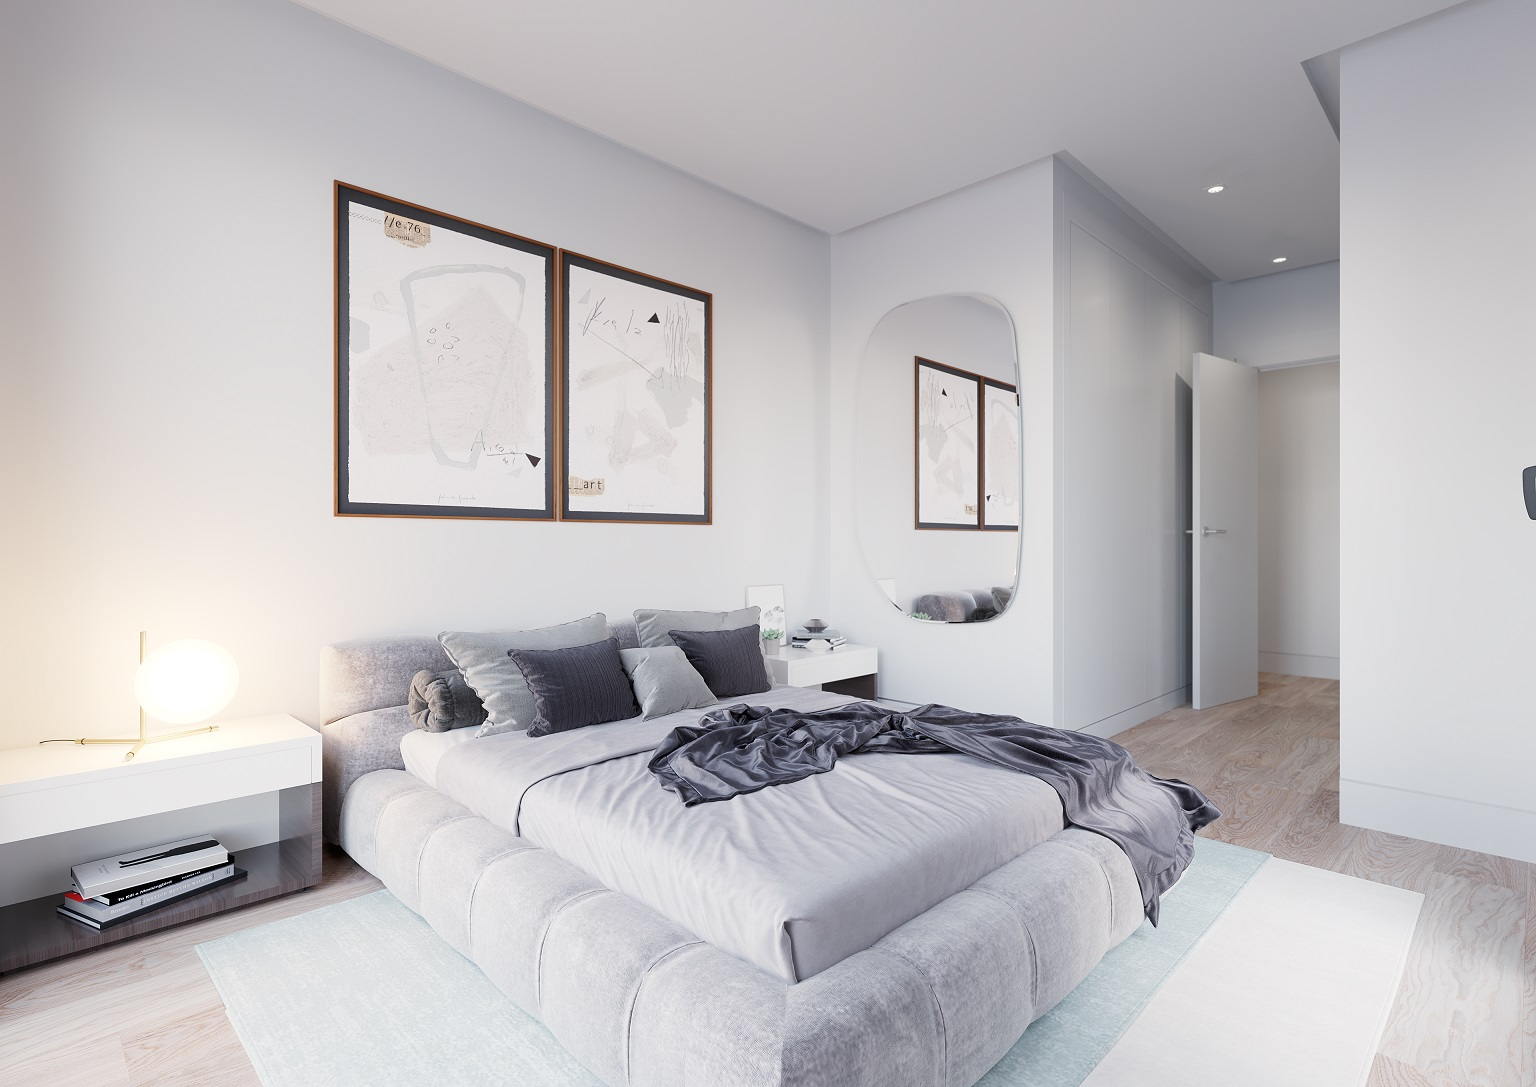 beluga_rueda_6A_dormitorio_61